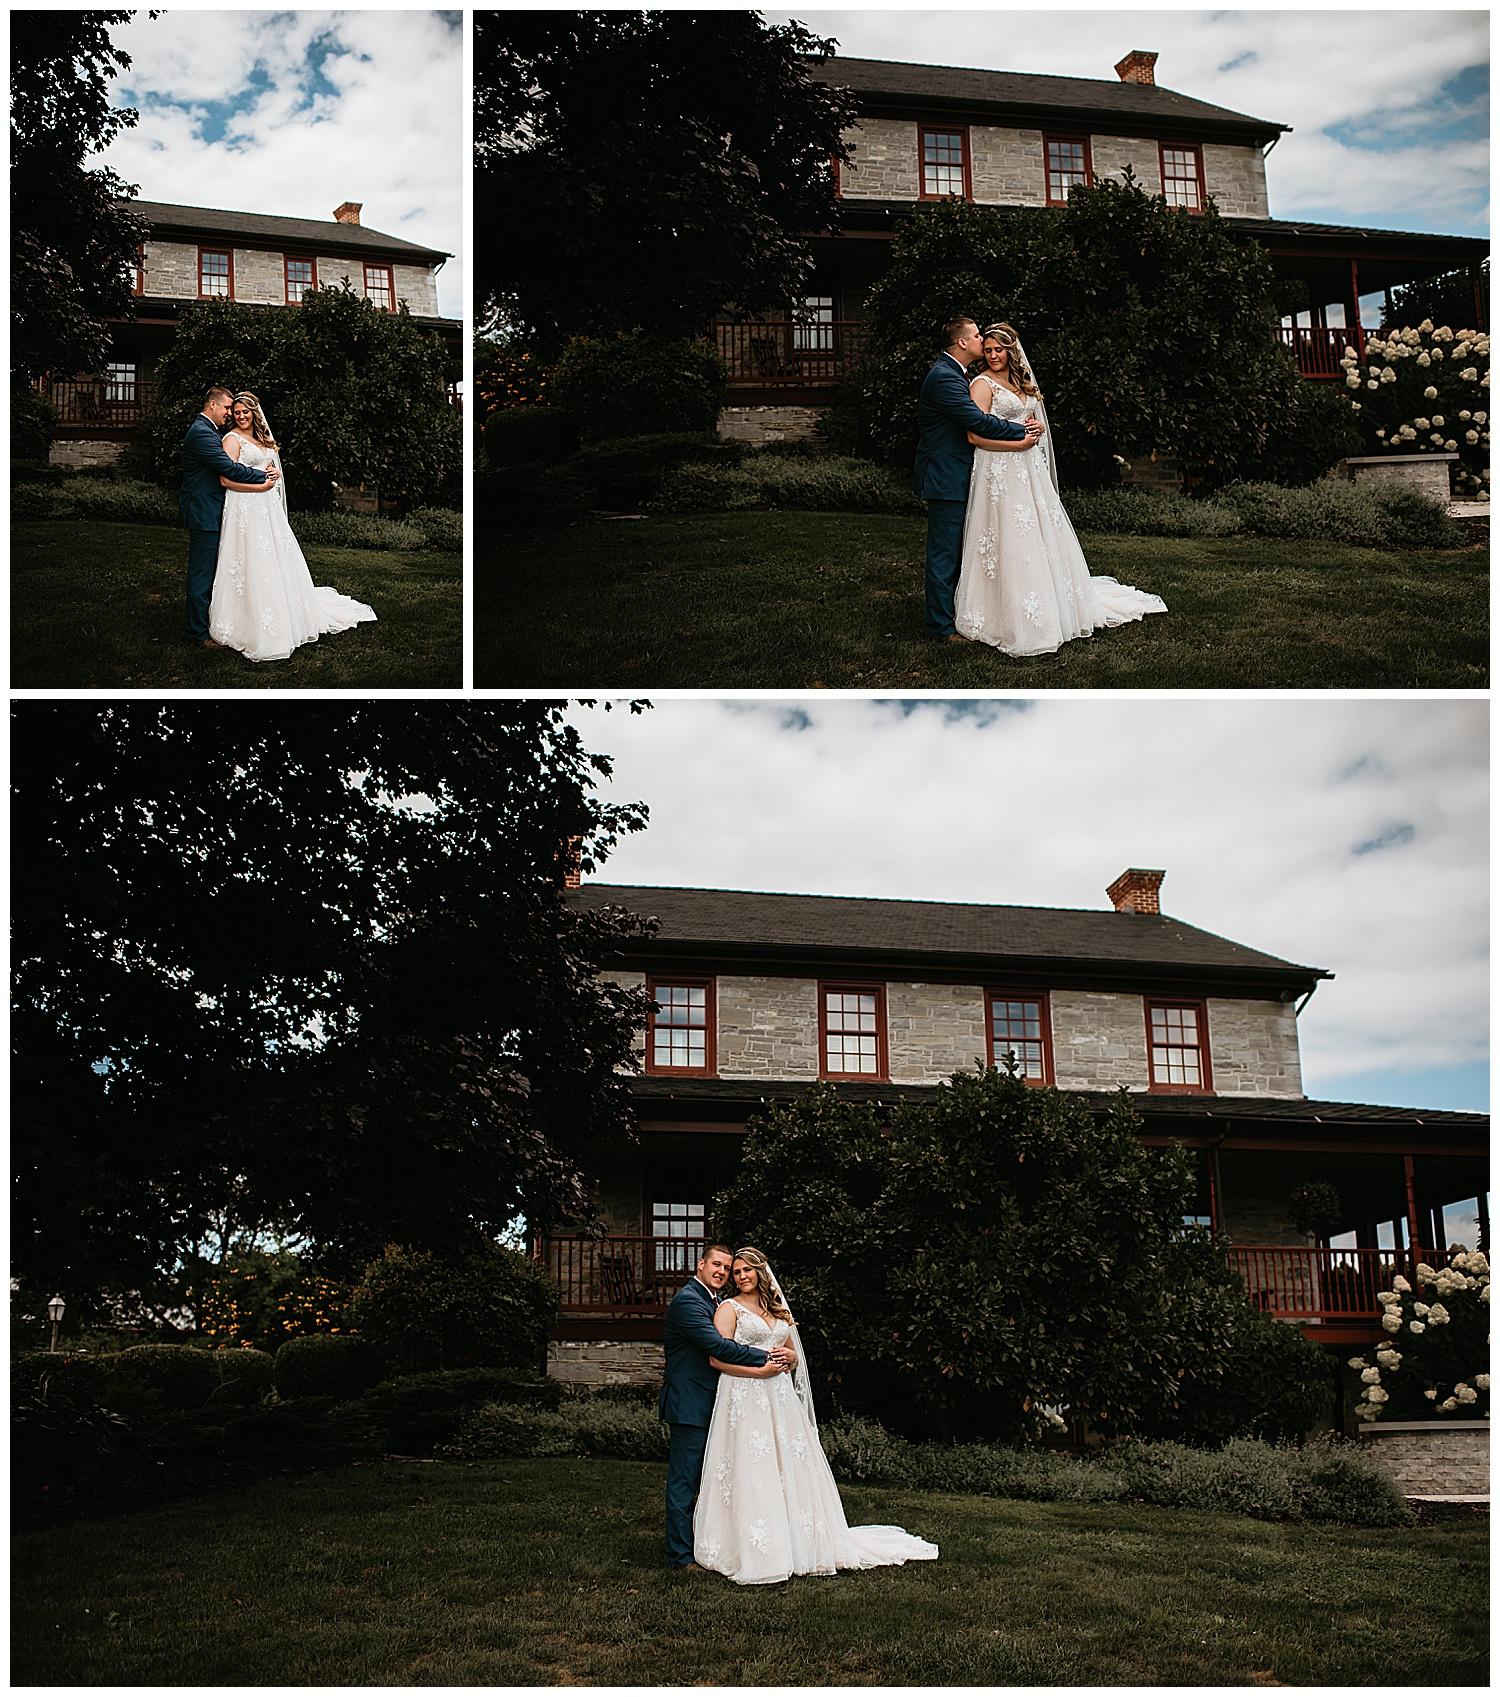 NEPA-Bloomgsburg-Wedding-Photographer-at-The-Barn-at-Greystone-Farms-Watsontown-PA_0034.jpg